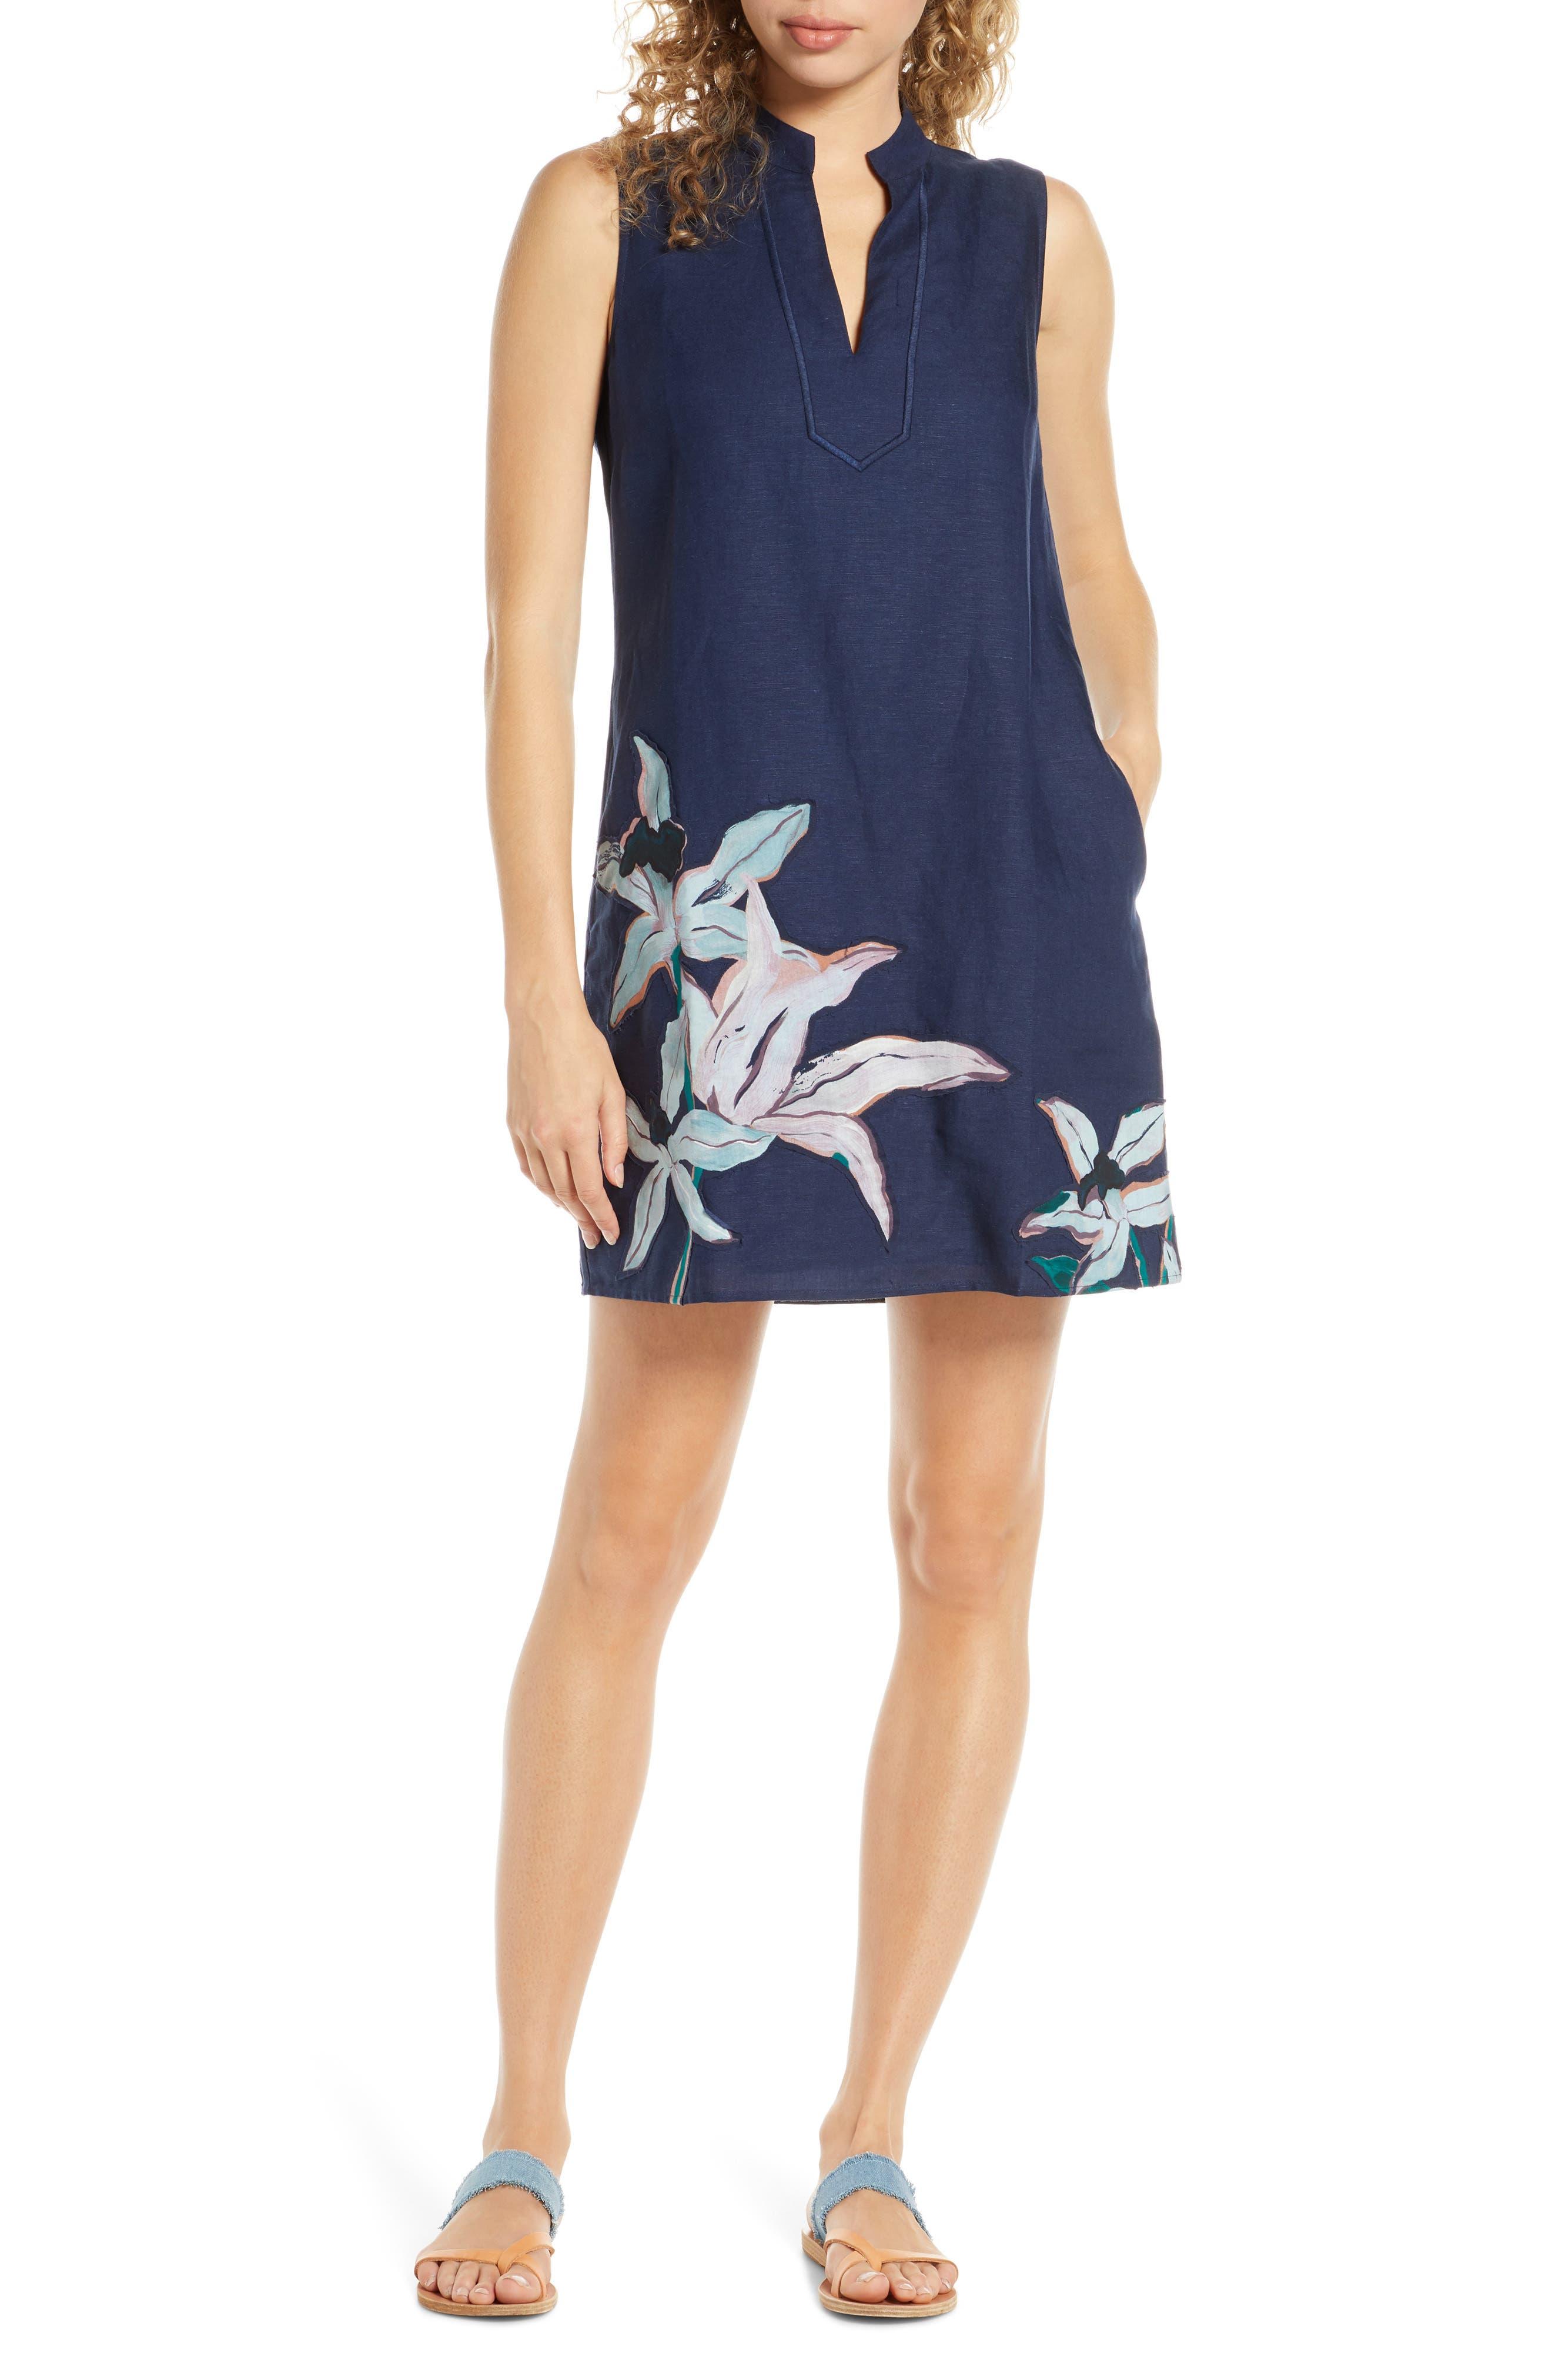 Tory Burch Sleeveless Cover-Up Dress, Blue